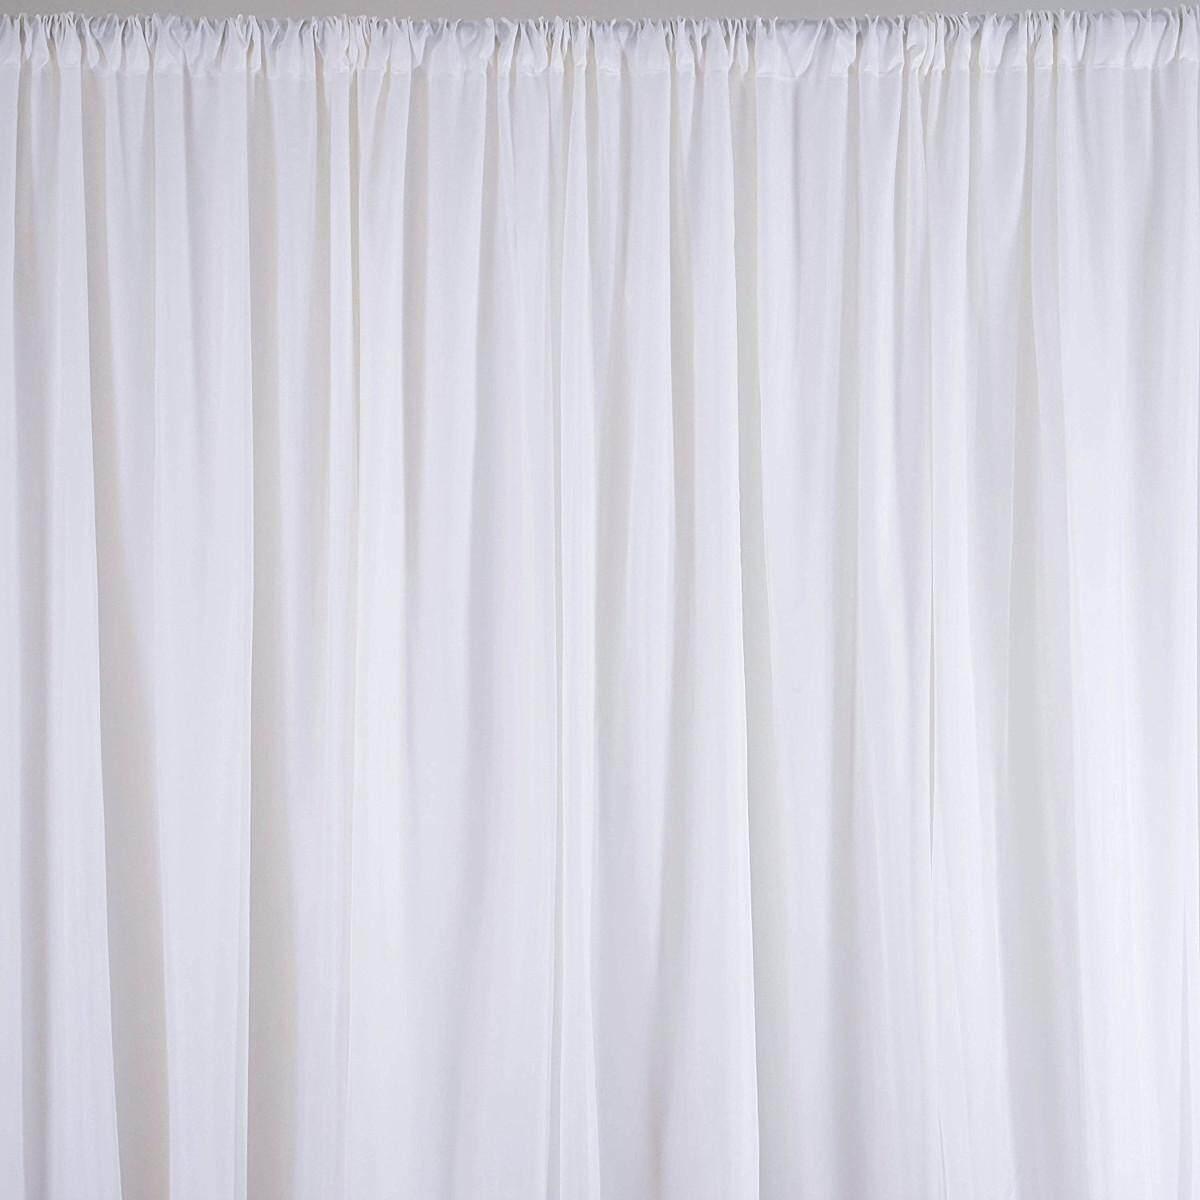 2.4M White Wedding Party Backdrop Curtain Drapes Background Decor Studio Draping